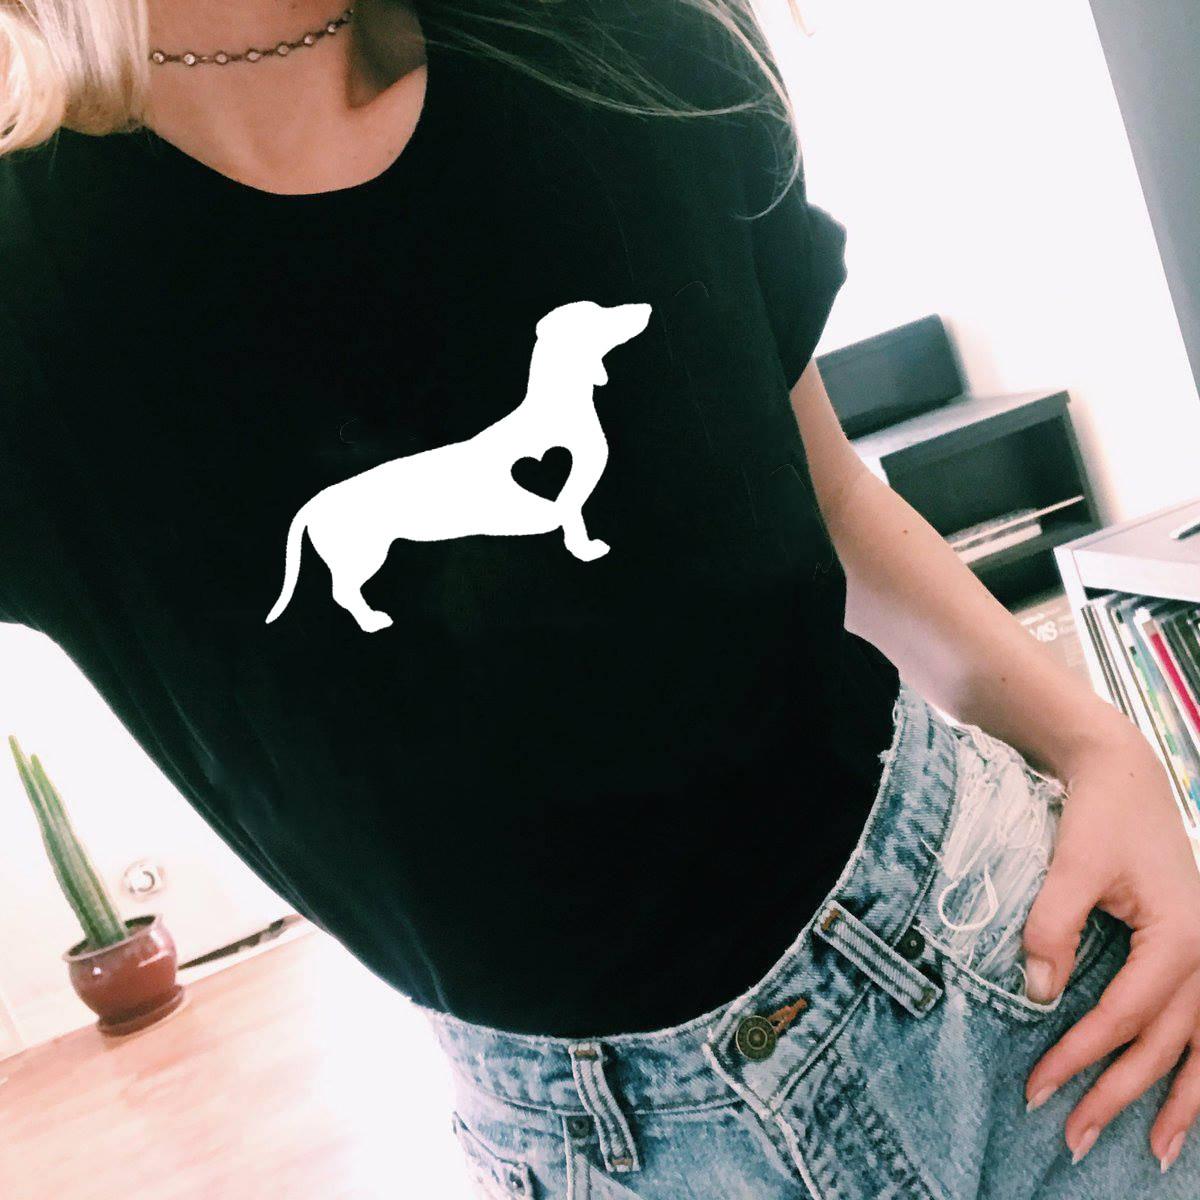 Dachshund Love Dog T-Shirt Doxie Shirt Wiener Dog Shirt Streetwear Tumblr T Shirts Women Causal Graphic Tee Harajuku Tops